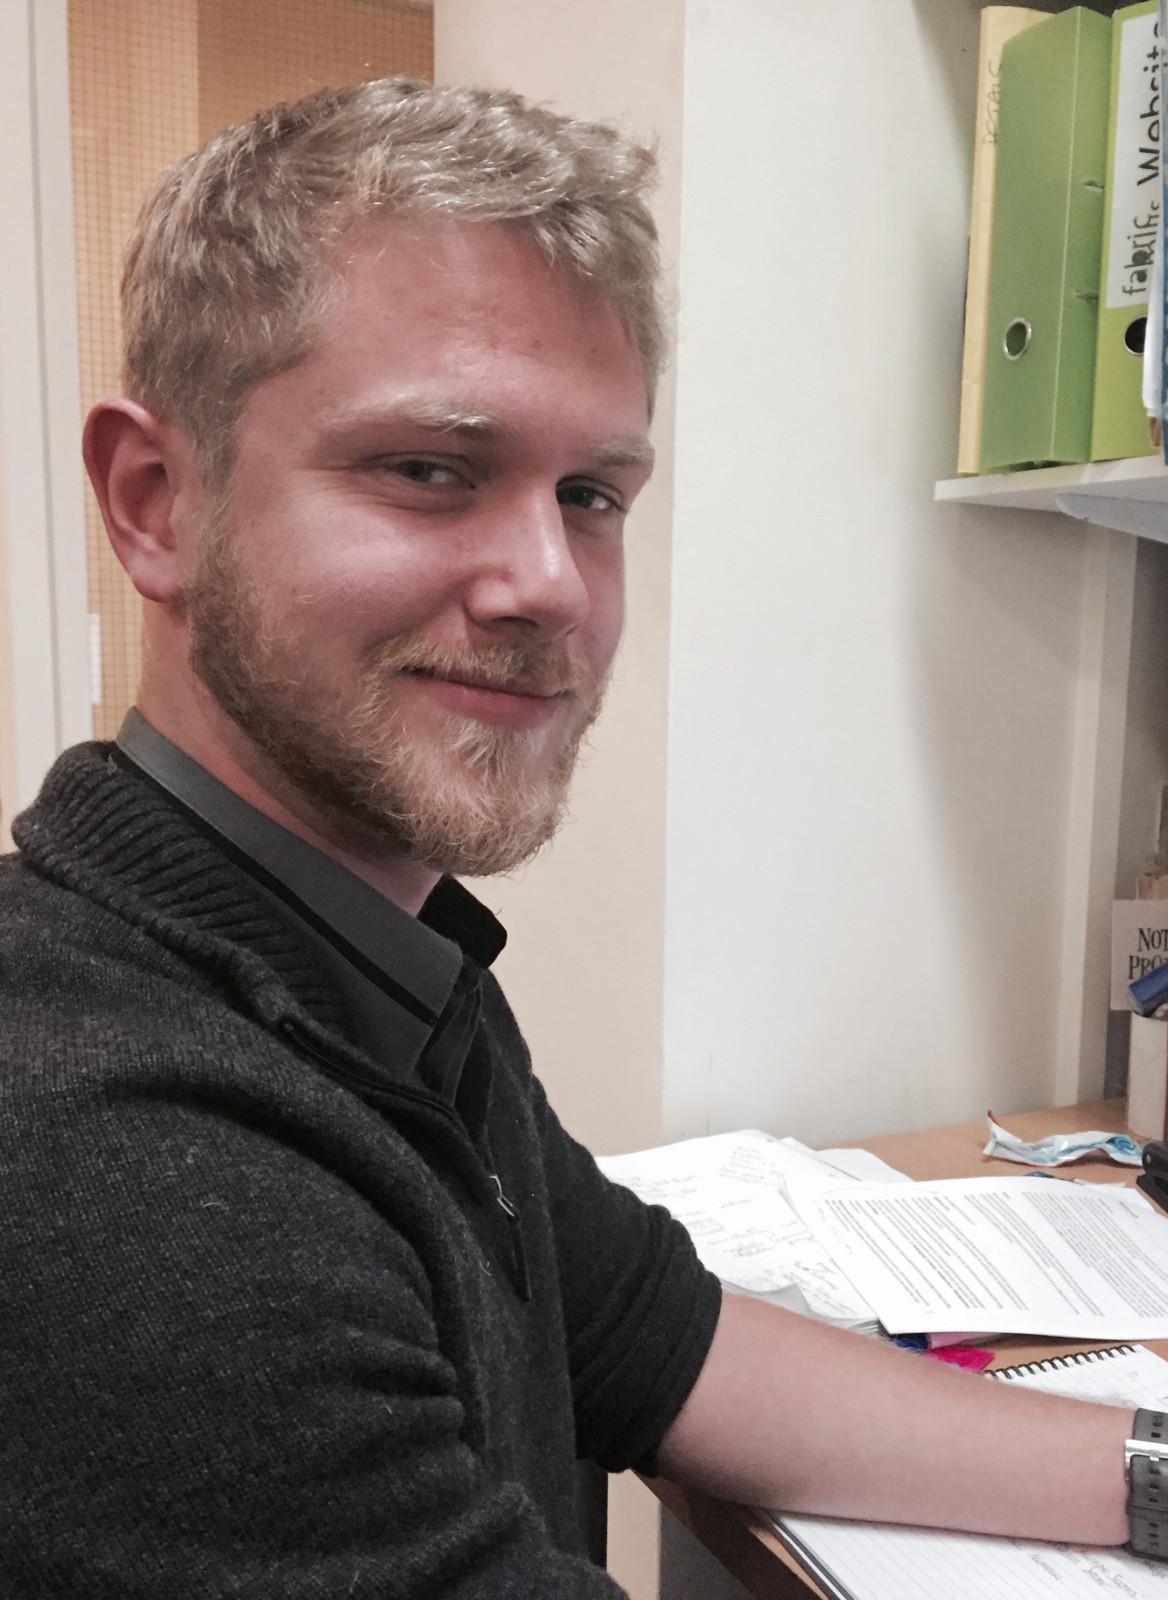 Mewscraft hires a new junior designer